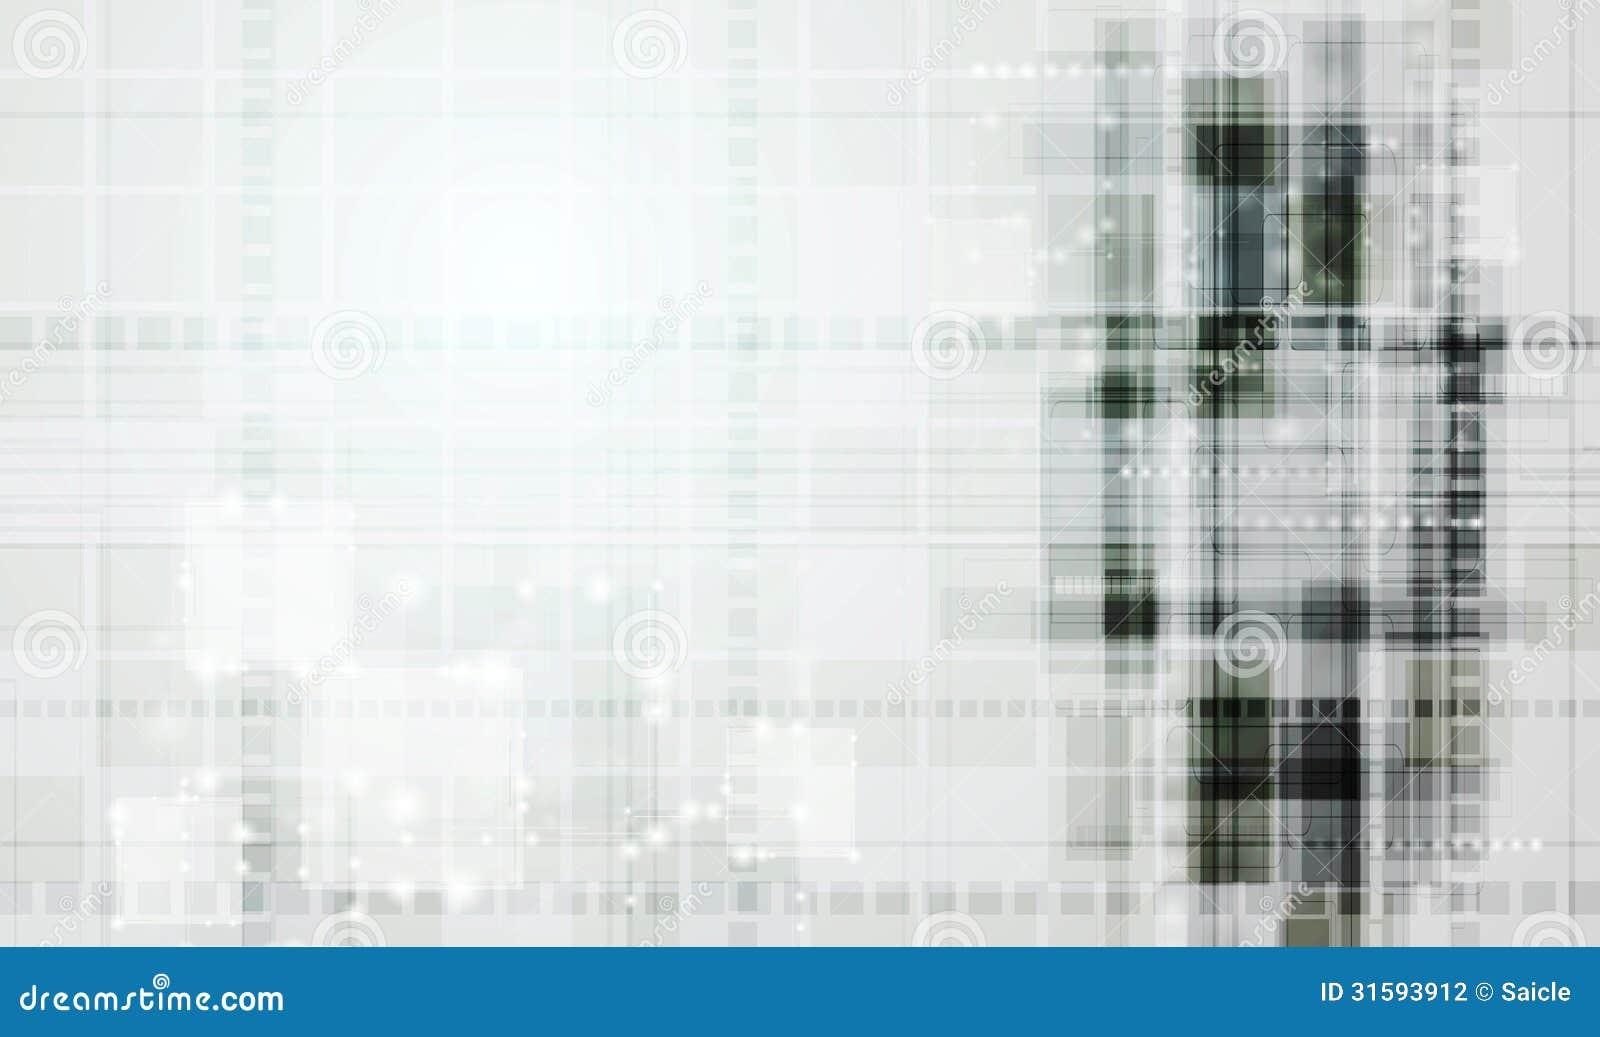 Abstracte technologie vectorachtergrond